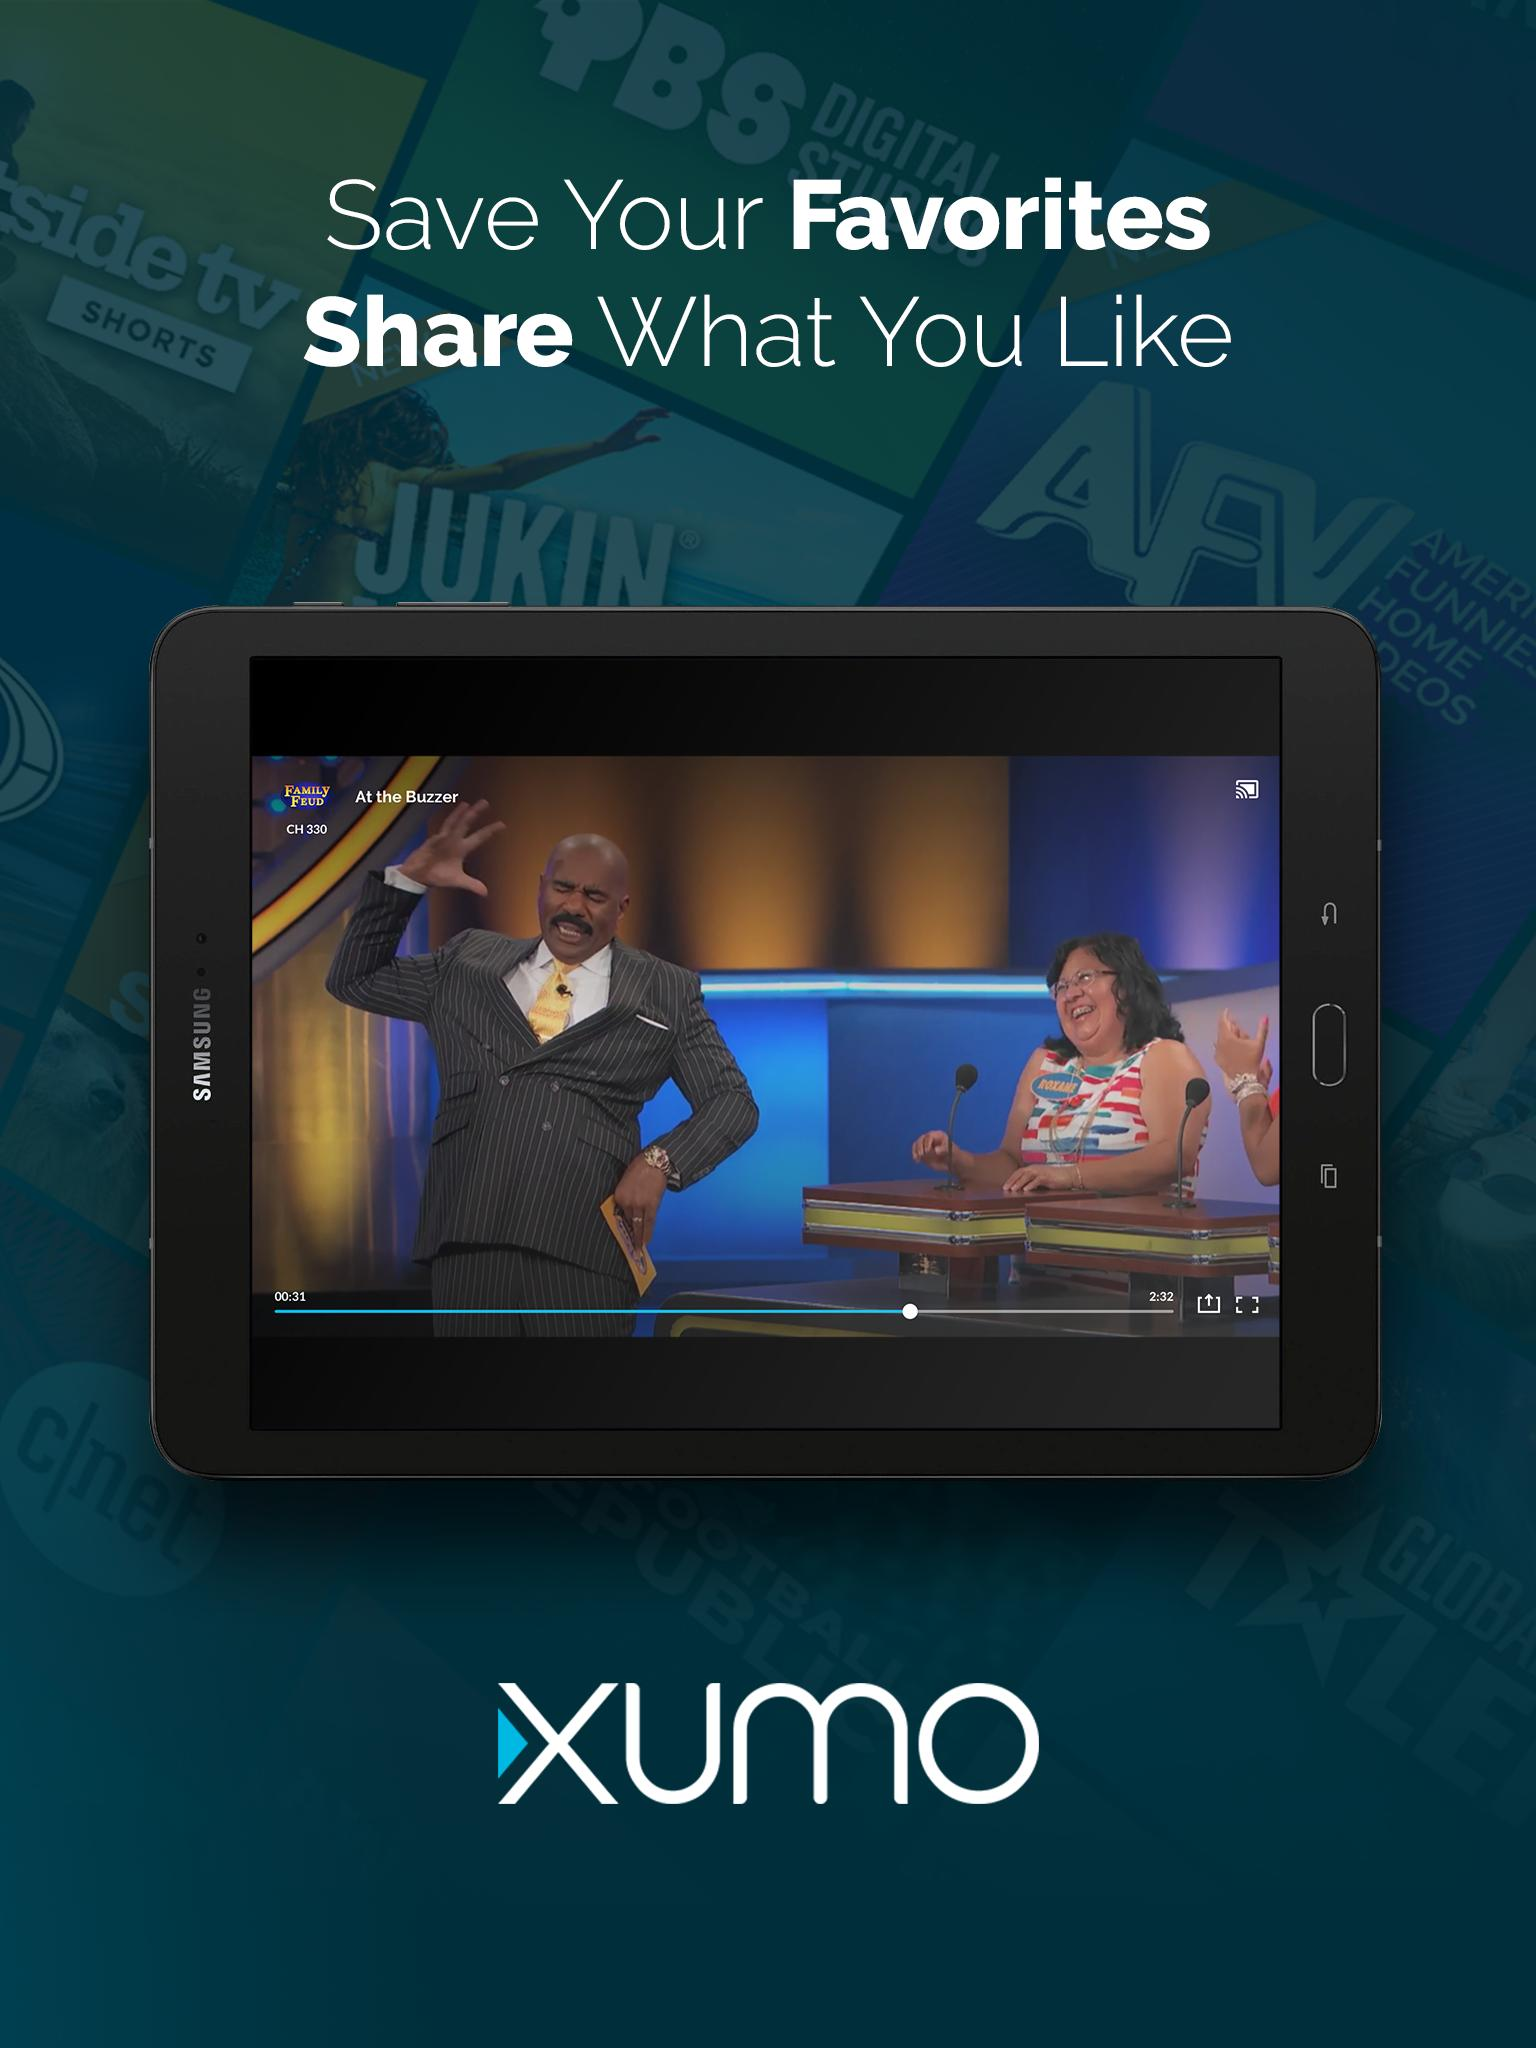 XUMO Free Streaming TV Shows and Movies 2.7.75 Screenshot 9